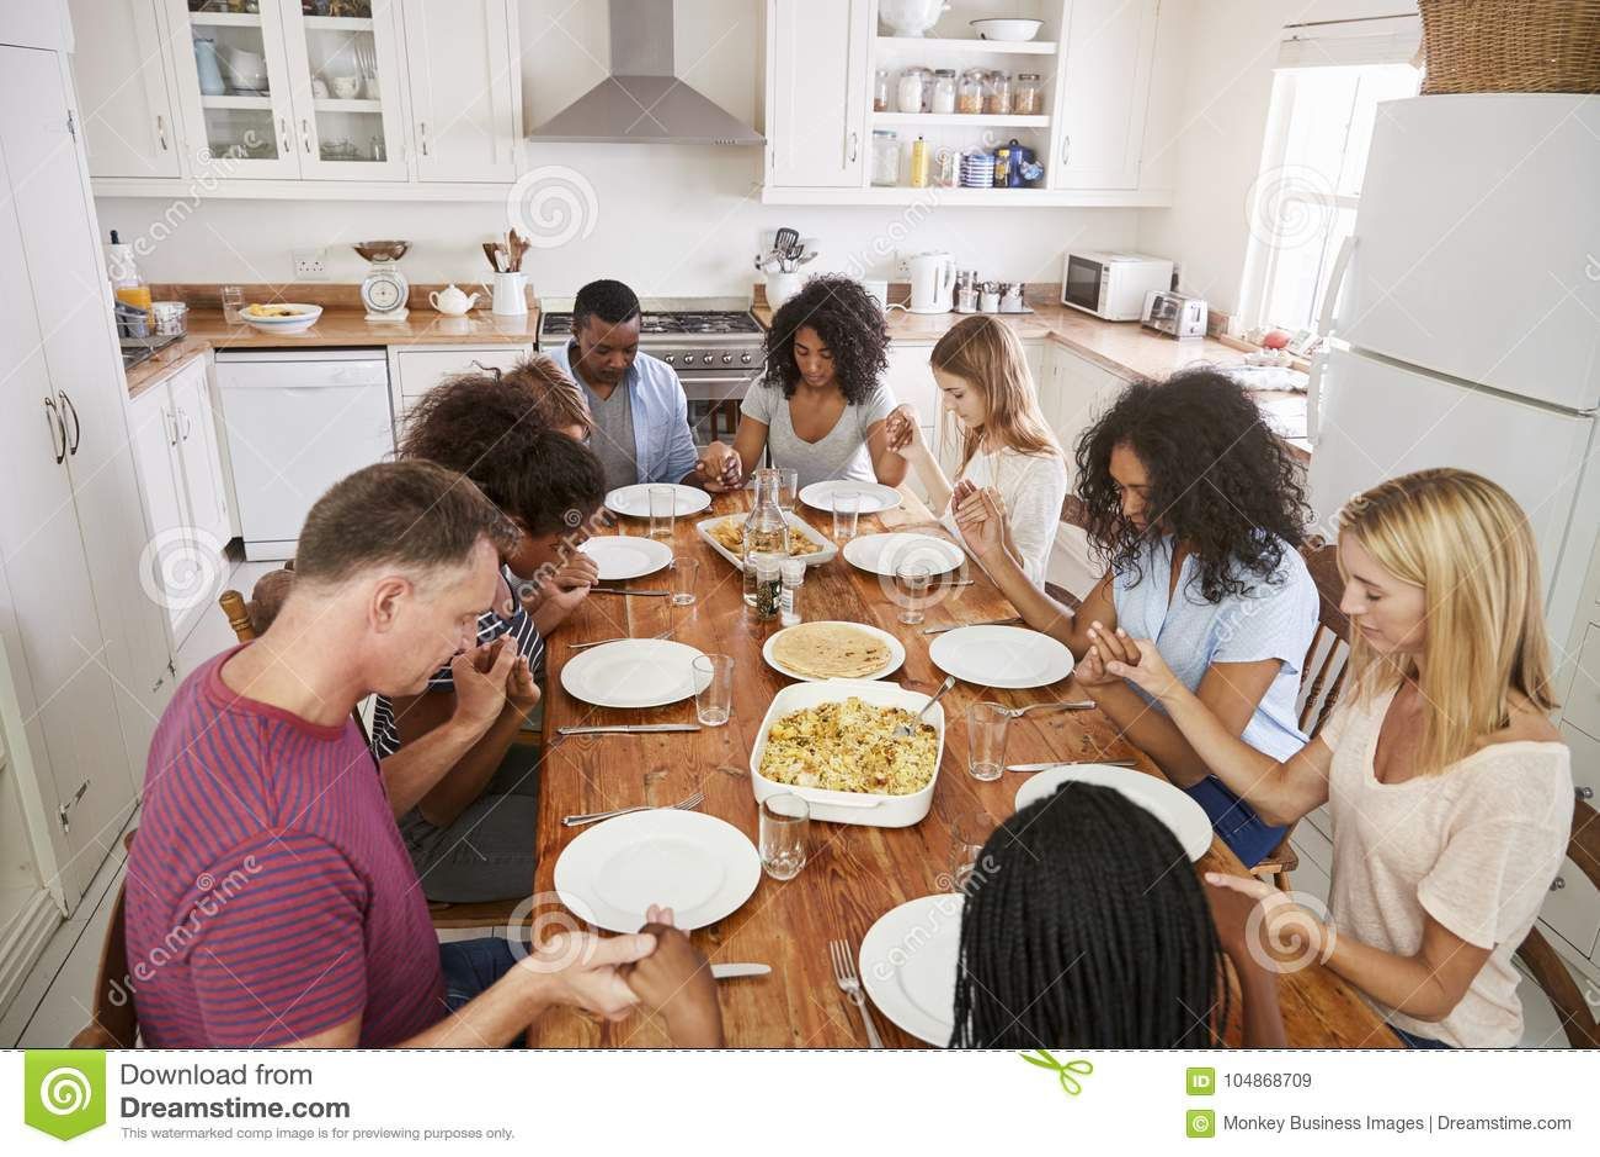 Twee Families die Grace Before Eating Meal Together zeggen